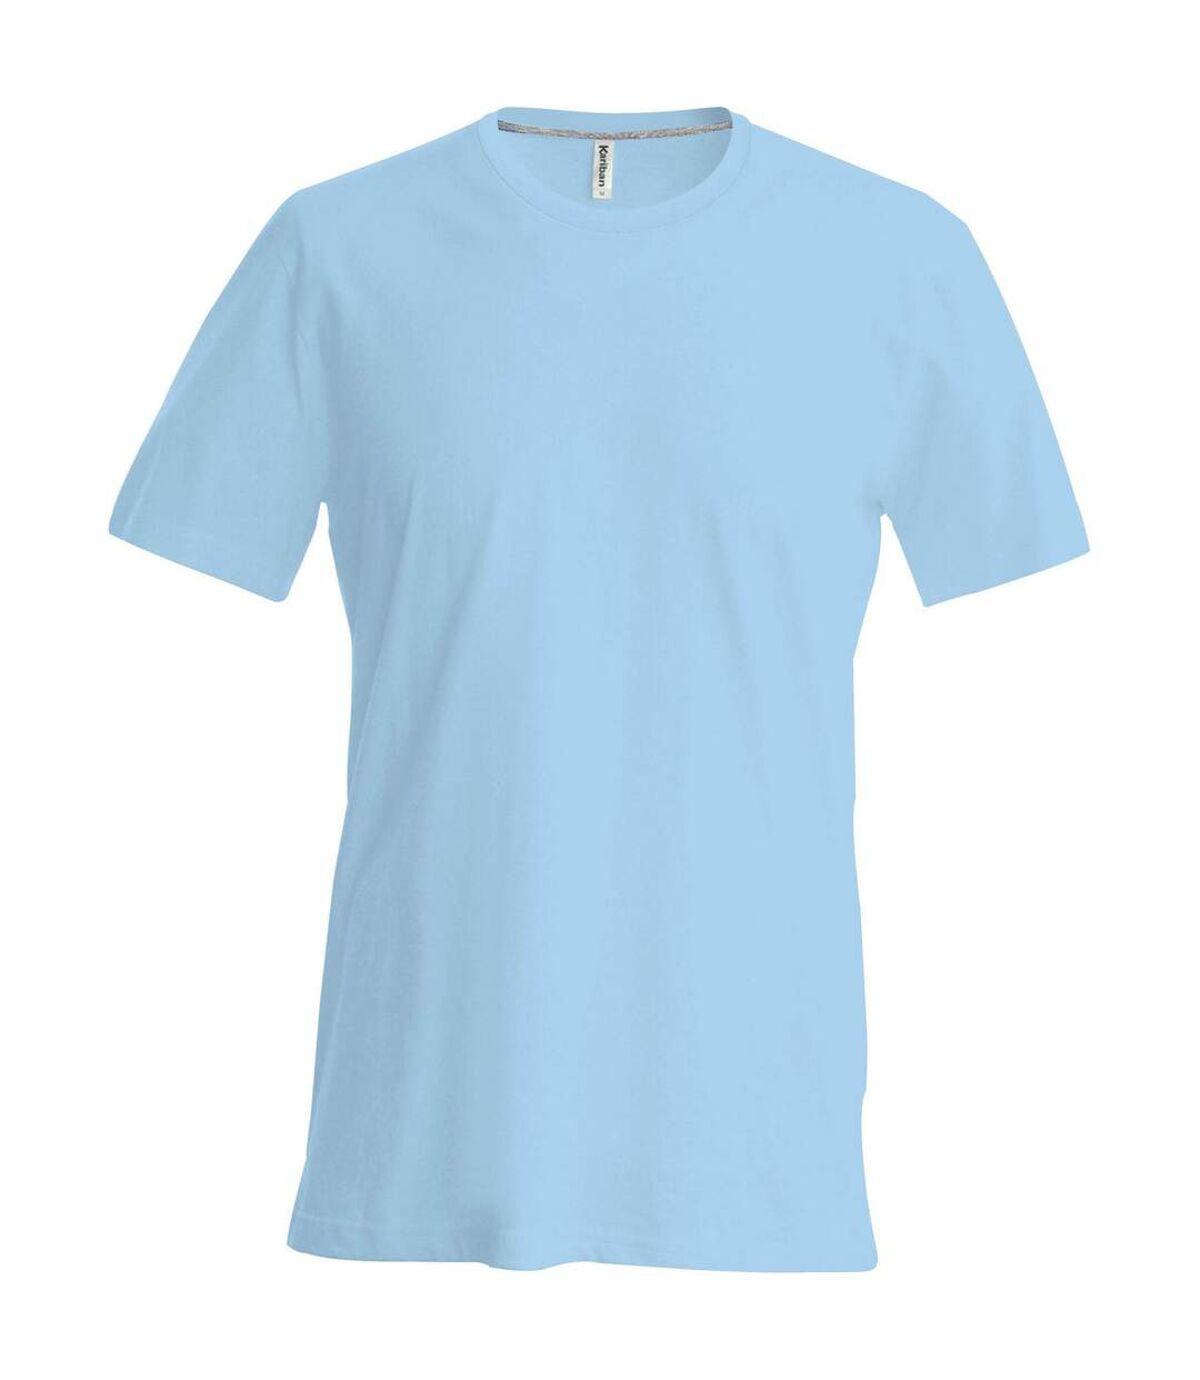 Kariban Mens Slim Fit Short Sleeve Crew Neck T-Shirt (Sky Blue) - UTRW706